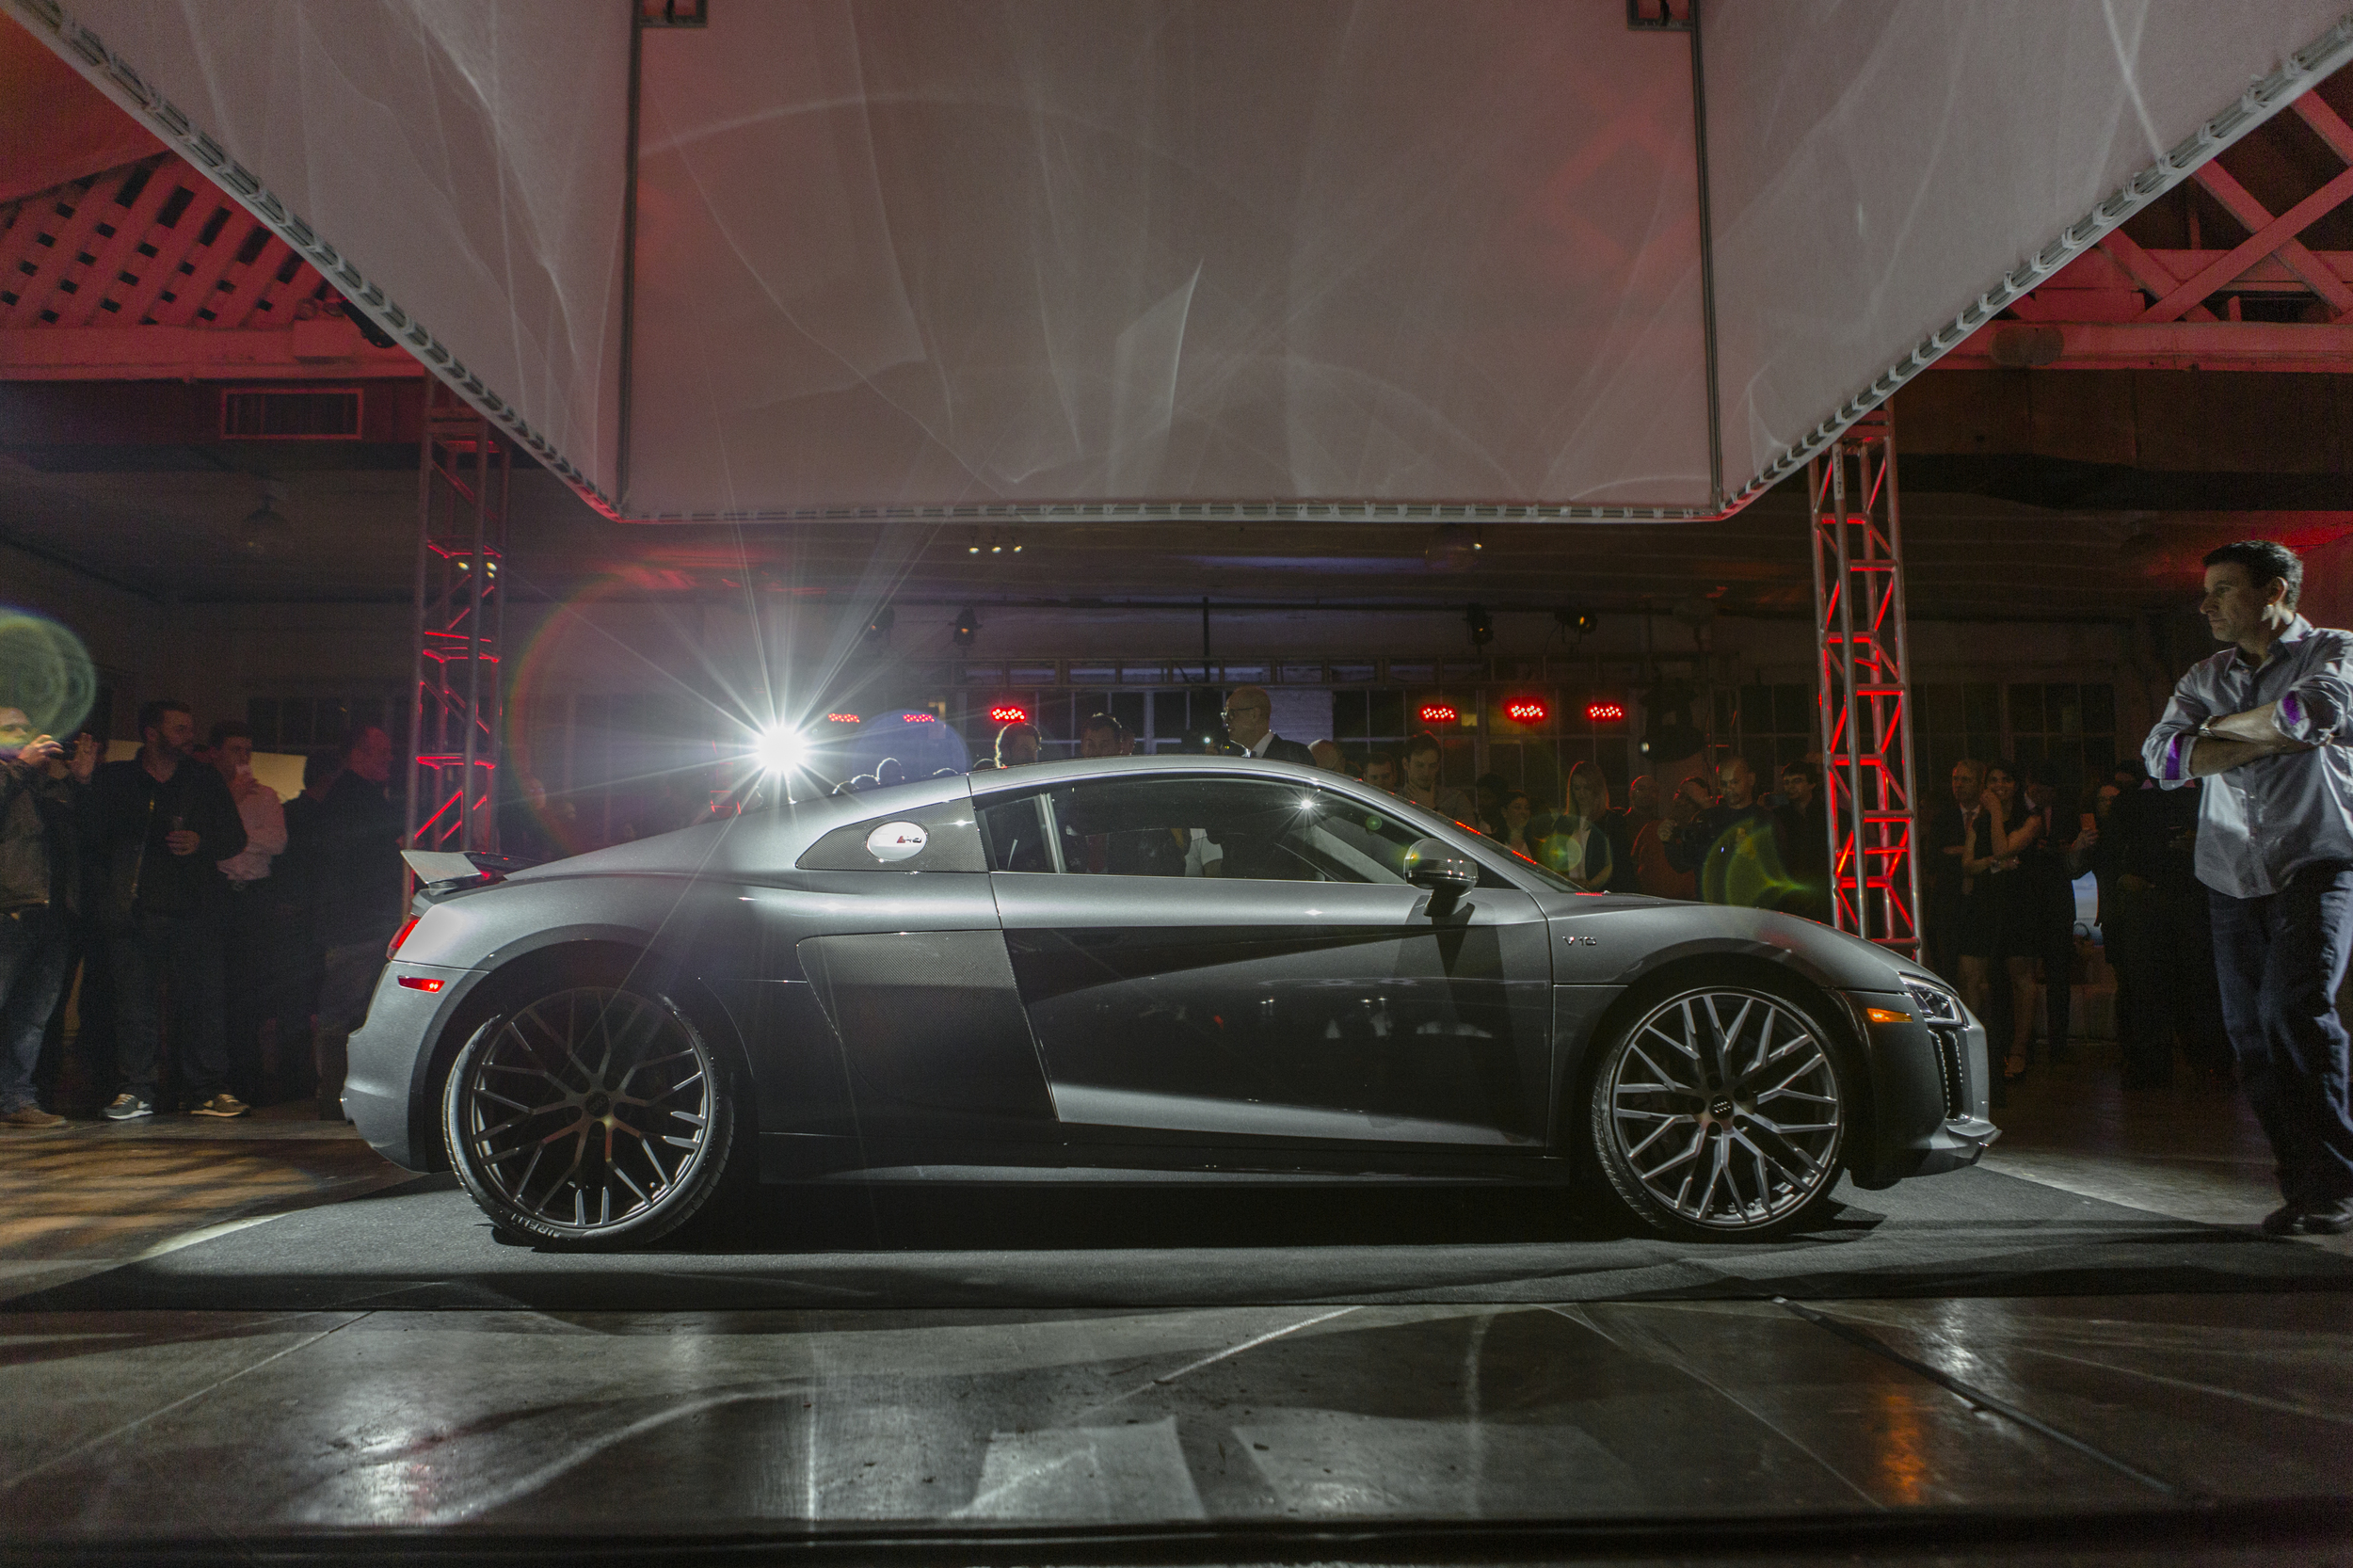 Audi-HD-145_B6A9504.jpg